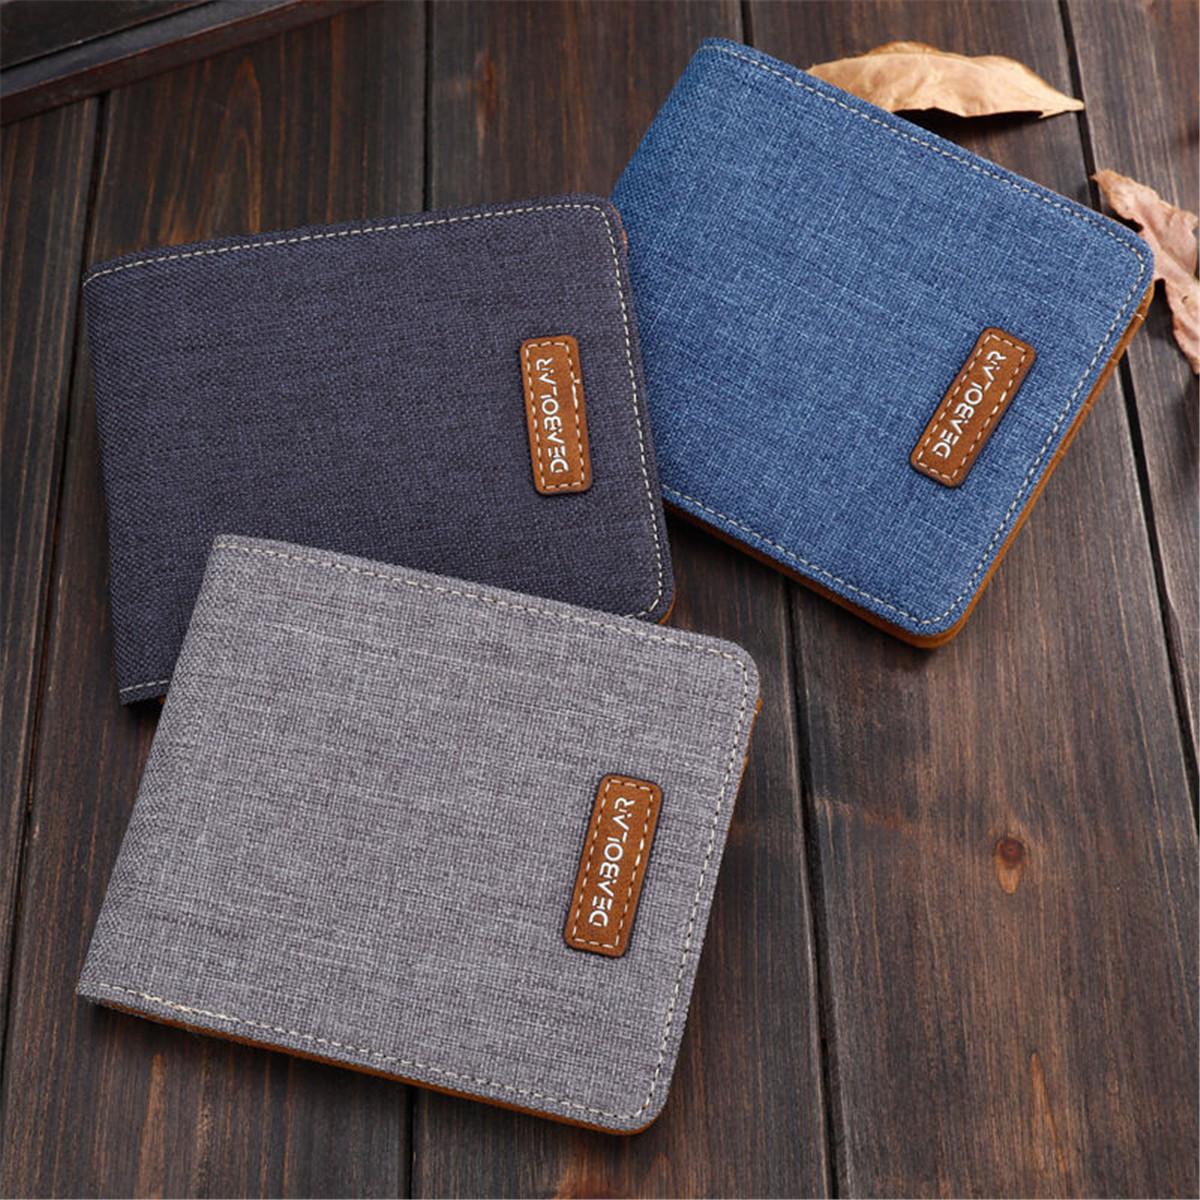 Men Canvas Slim Billfold Wallet Clutch Handbag Credit Card Purse Holder